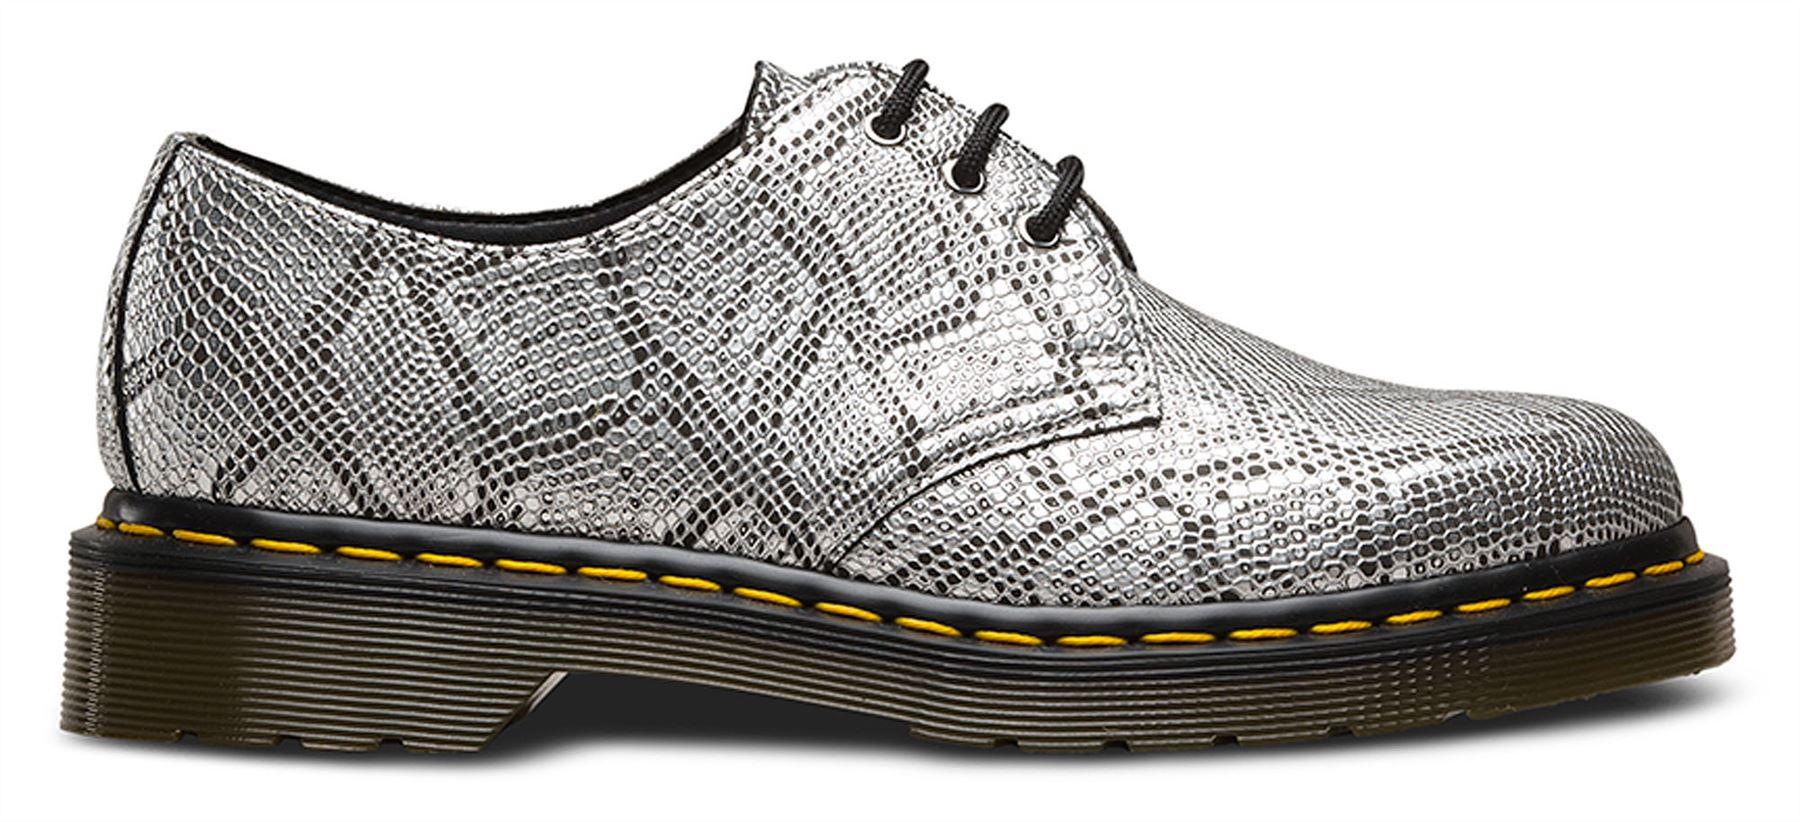 3cdcc0817b5 Dr Martens 1461 Vegan Vegetarian Pascal Metallic Silver Snake Shoes ...